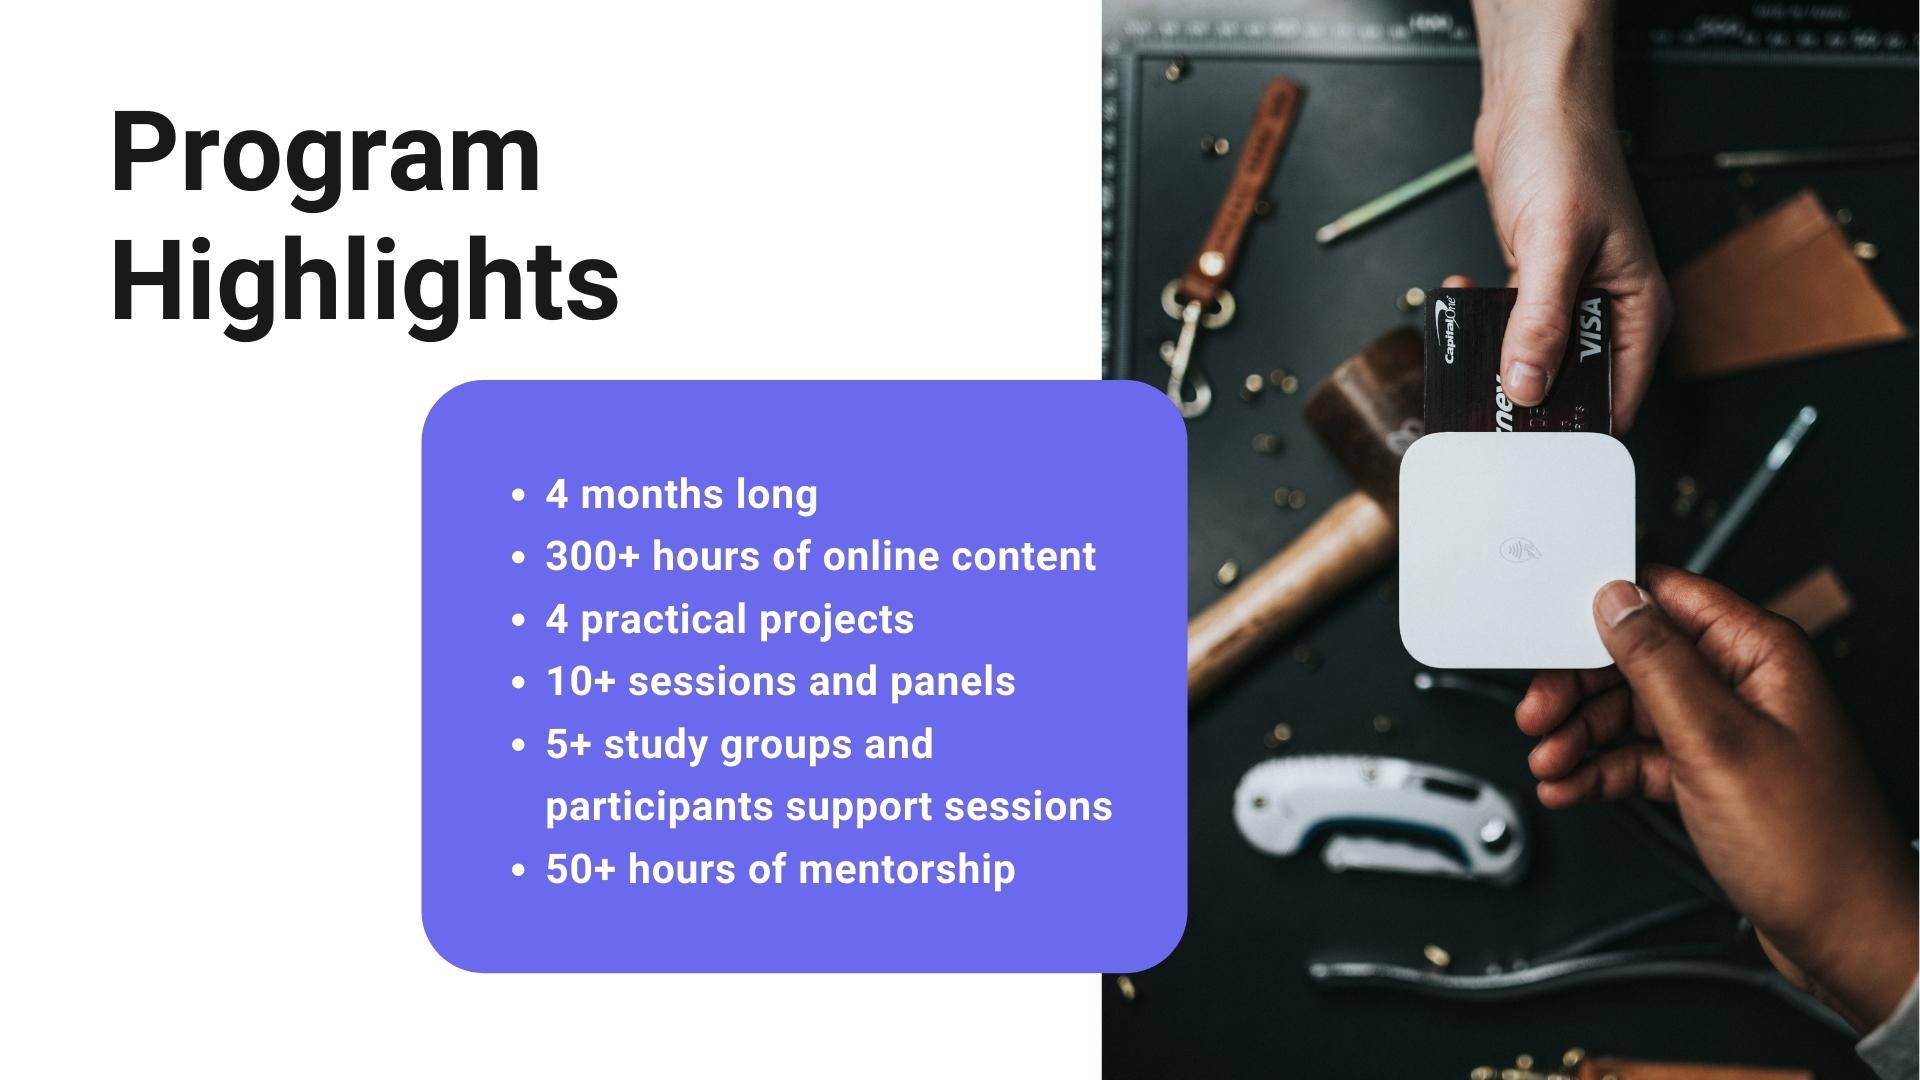 Programme Highlights